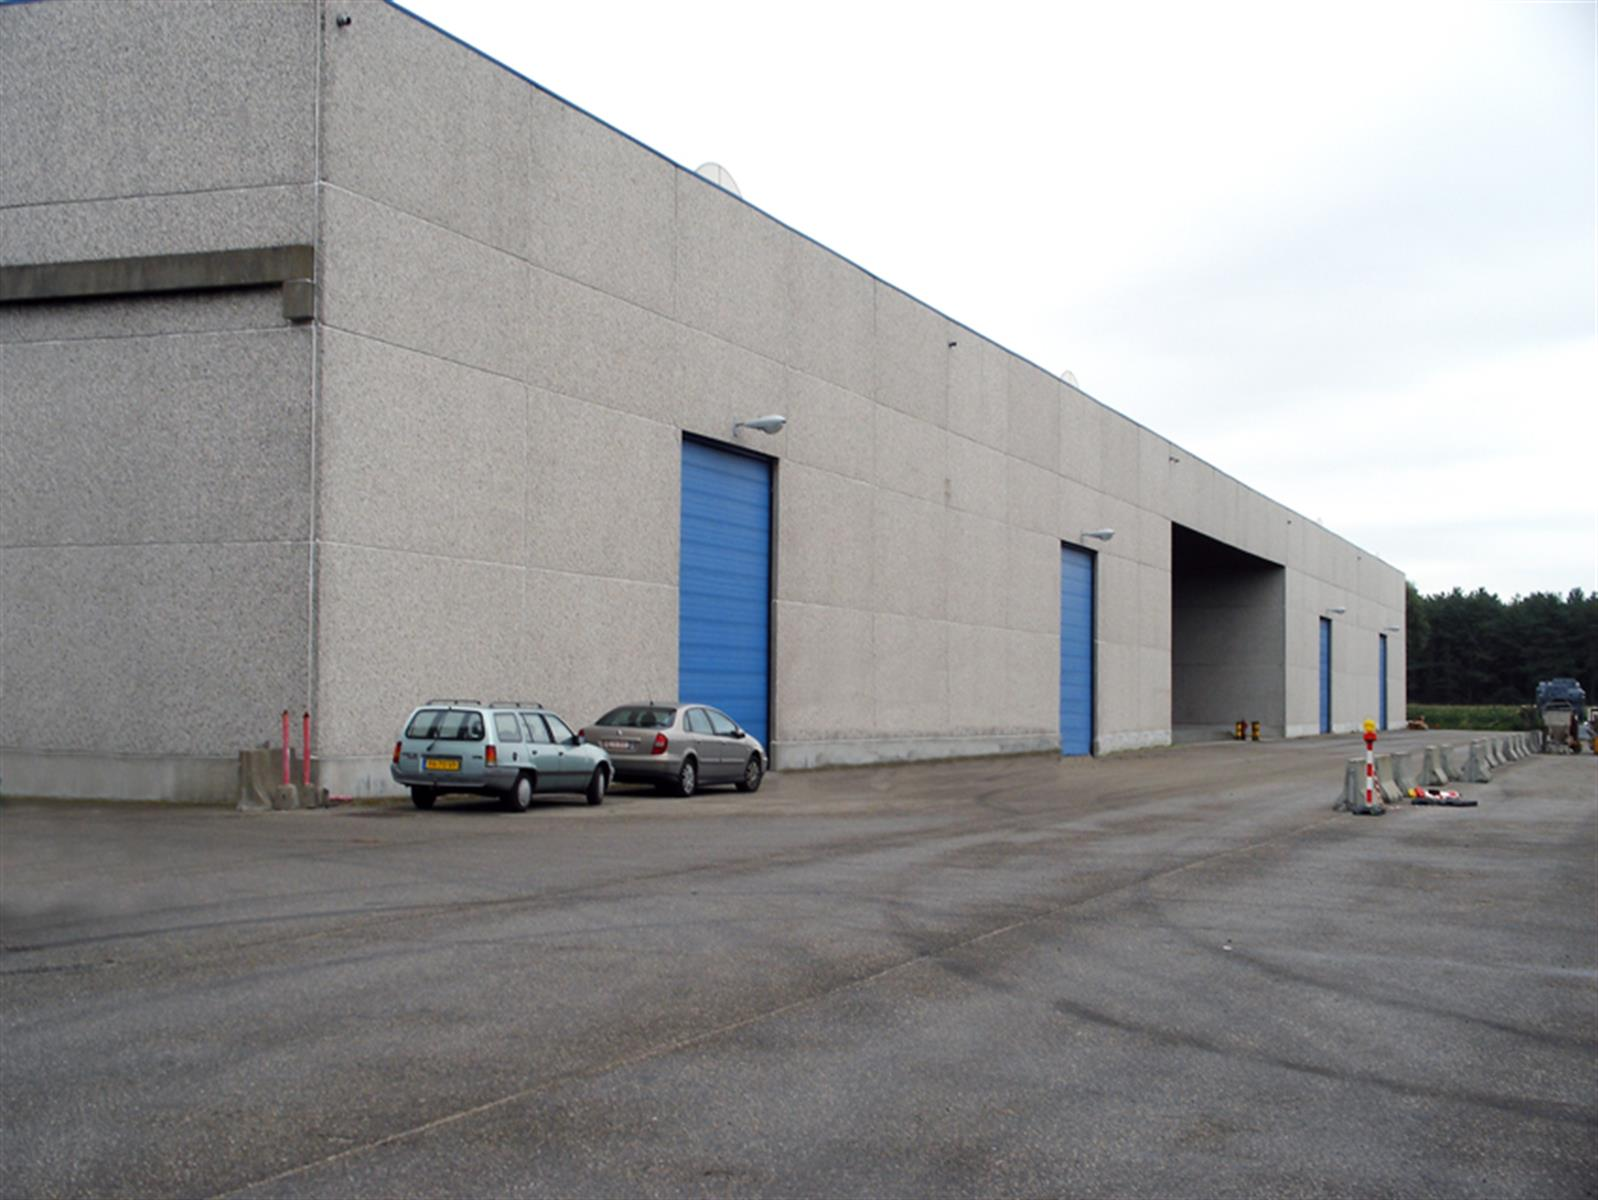 industrieel gebouw te huur KMO UNIT 1620m² MEERDERE LOADING DOCKS te KAPELLEN (B002) 1640m² - 2950 Kapellen, België 3